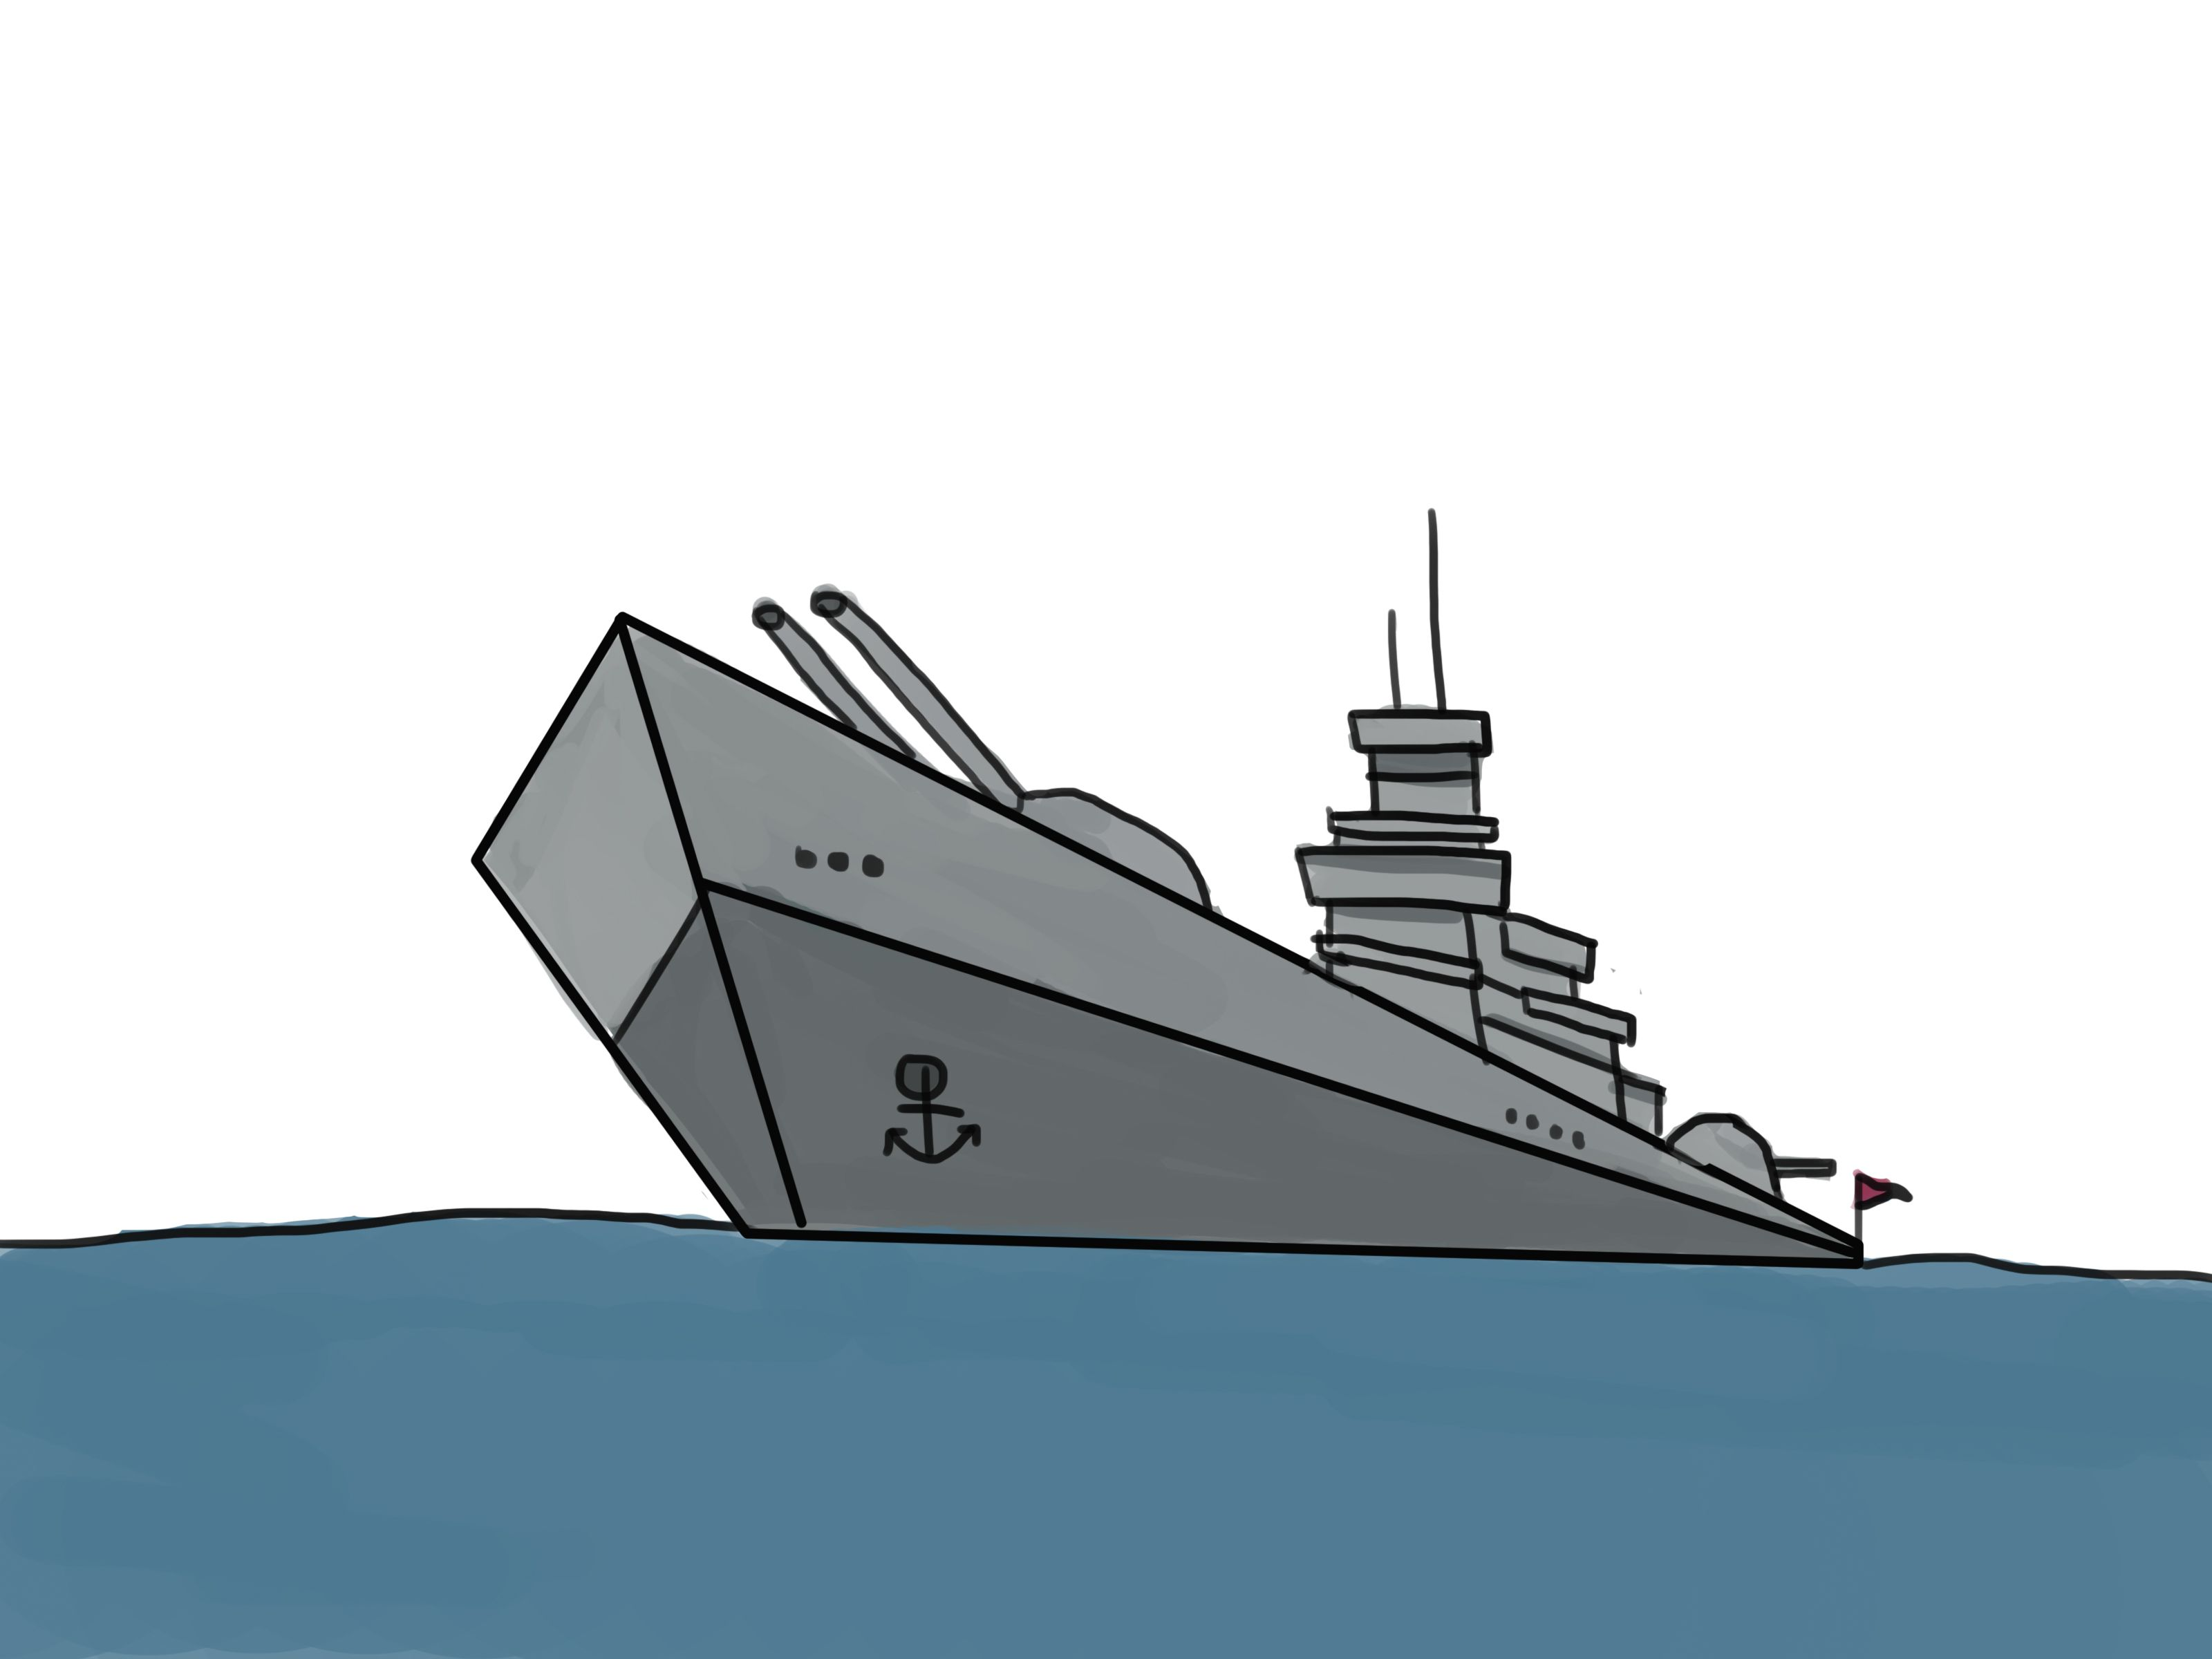 Titanic Sinking Coloring Pages Idalias Salon